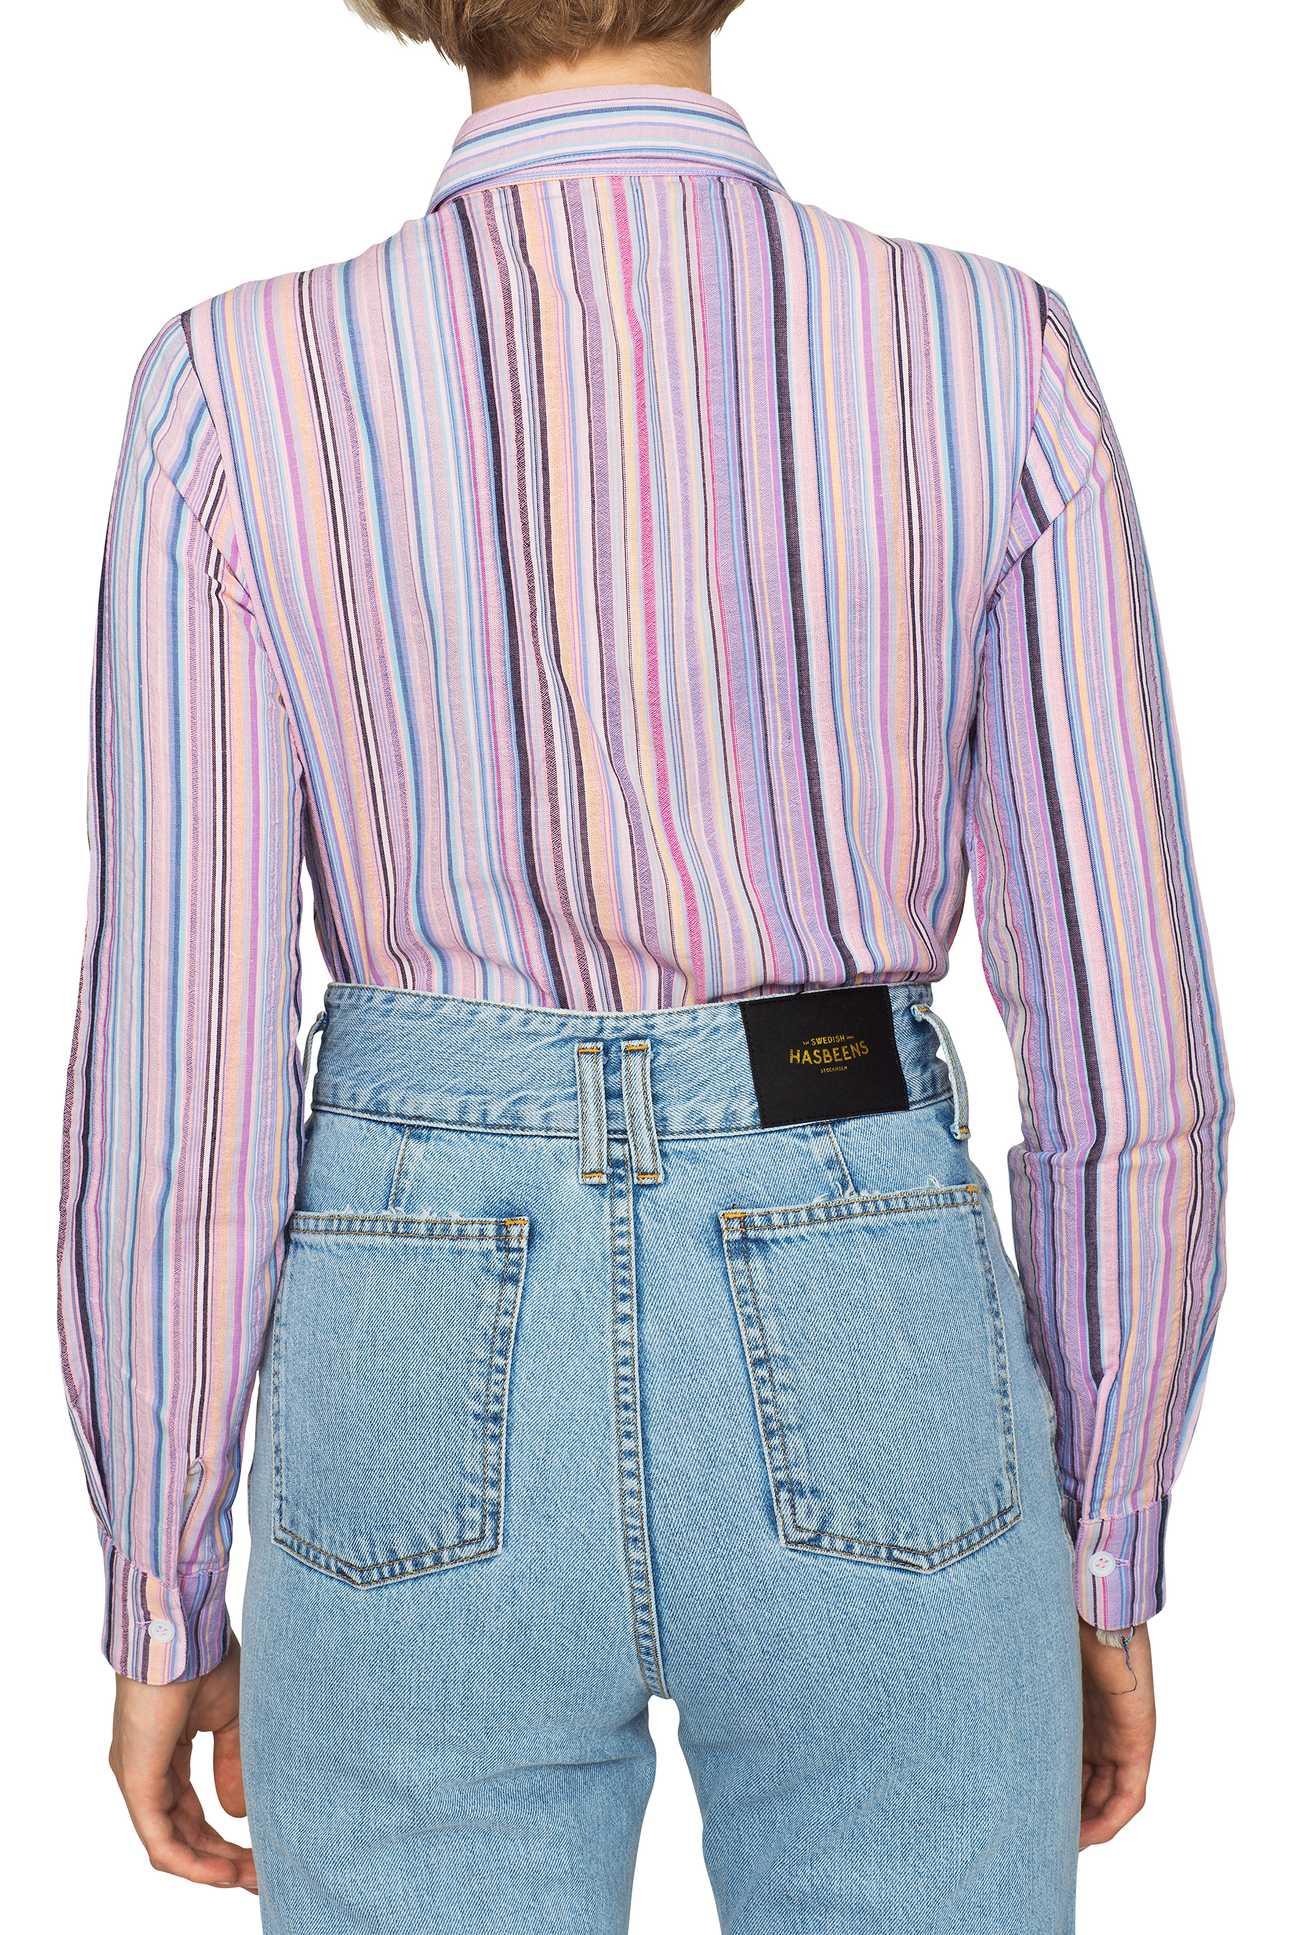 Product image Tight Shirt